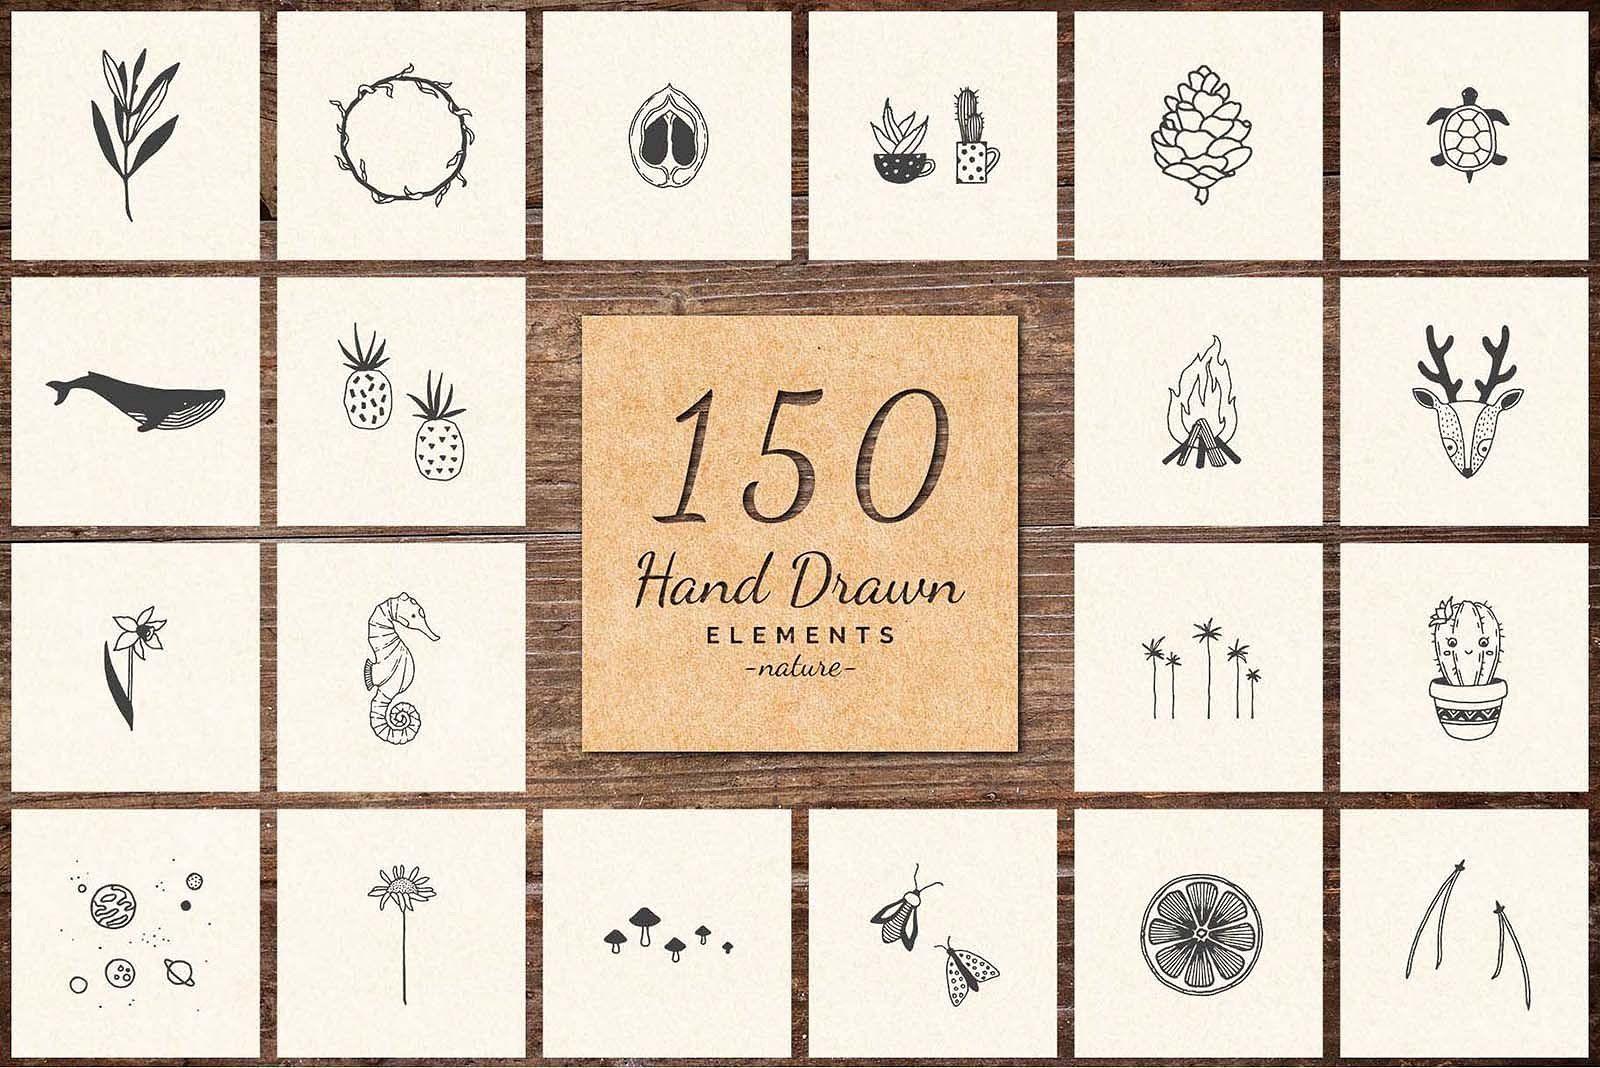 500 Hand Drawn Elements.